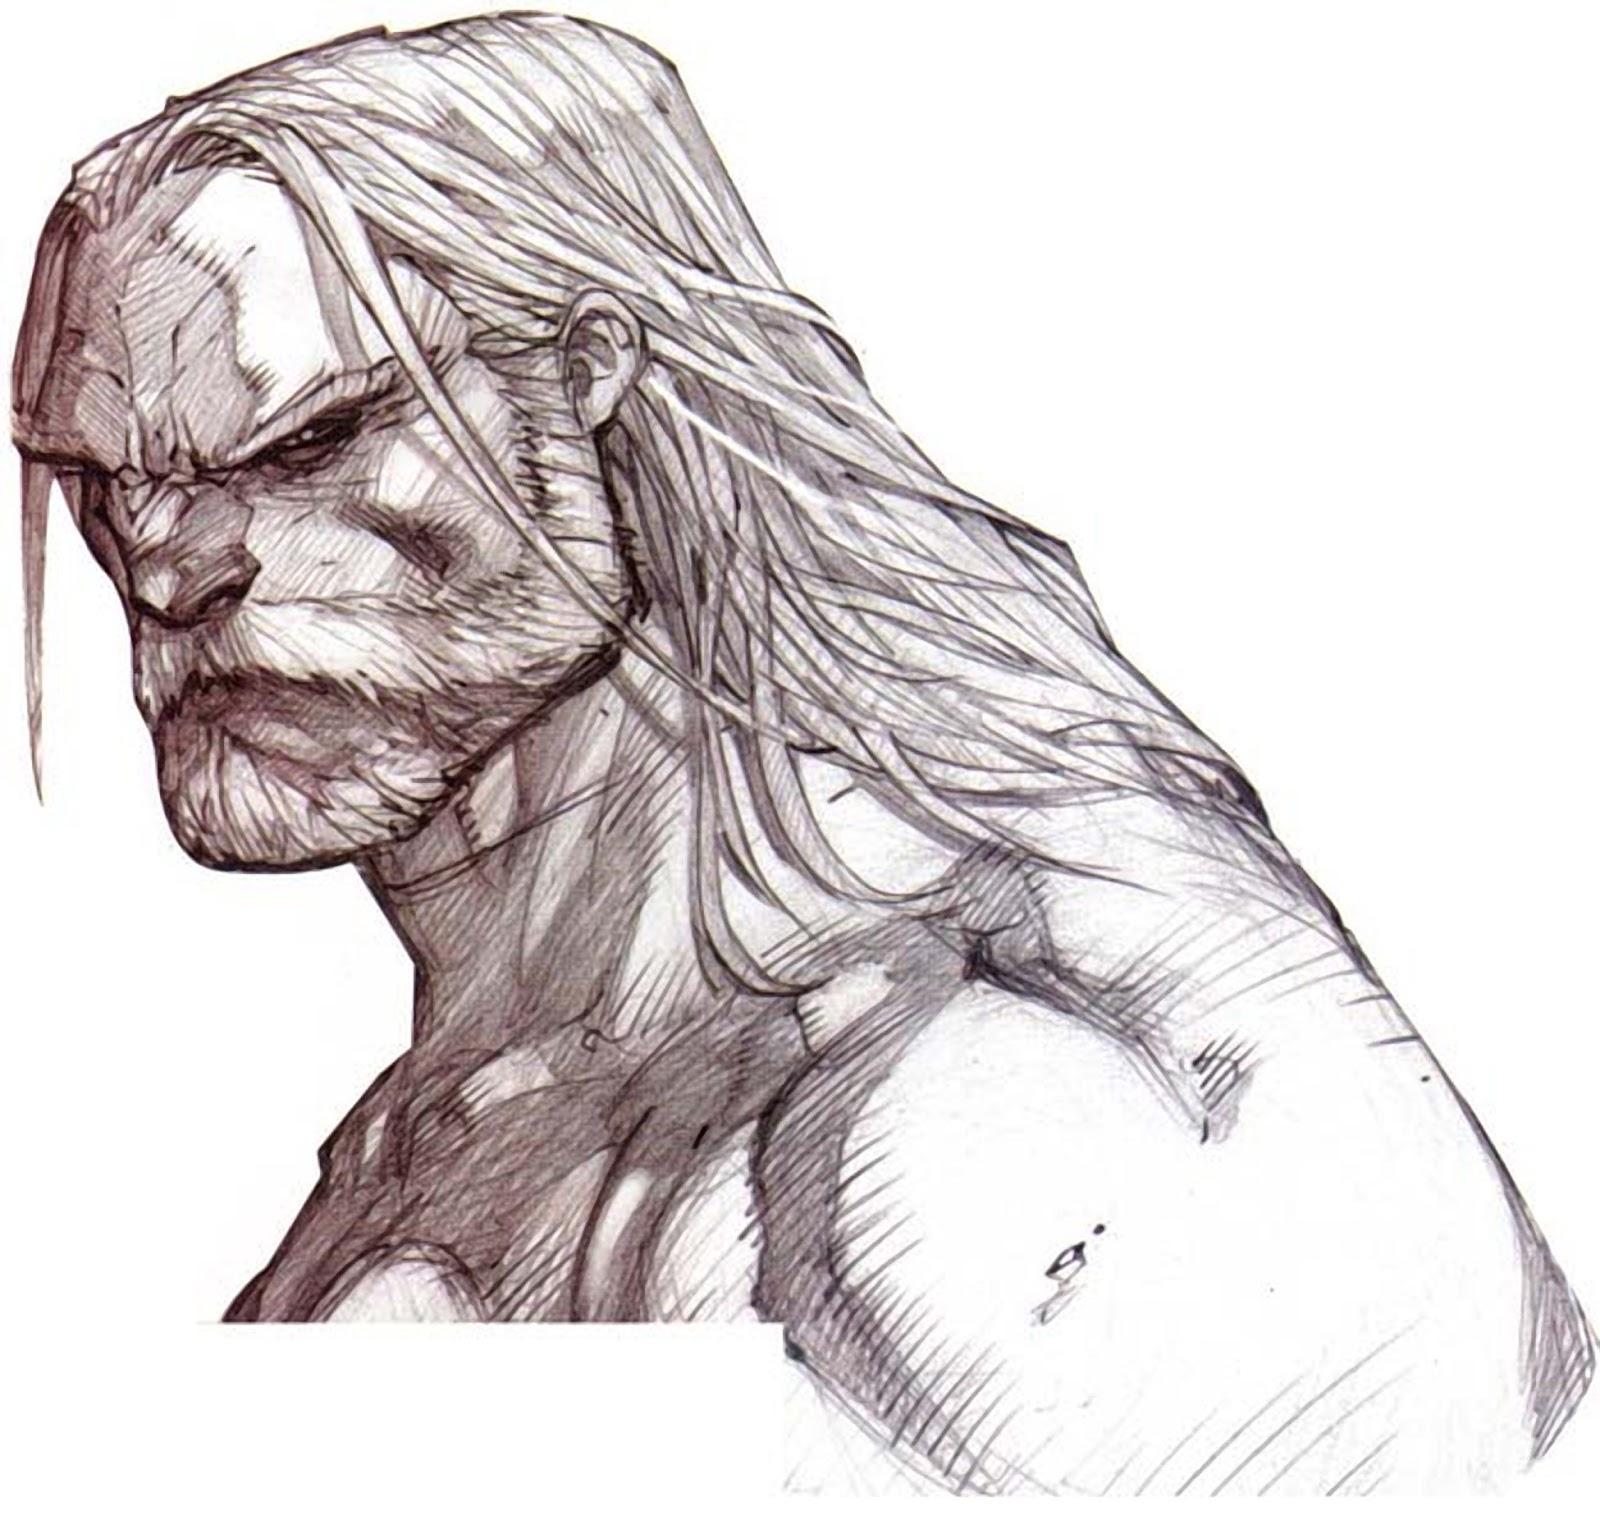 Art Of Comics And Manga: A Wolf Illustrations Blog: Joe Madureira Sketchbook